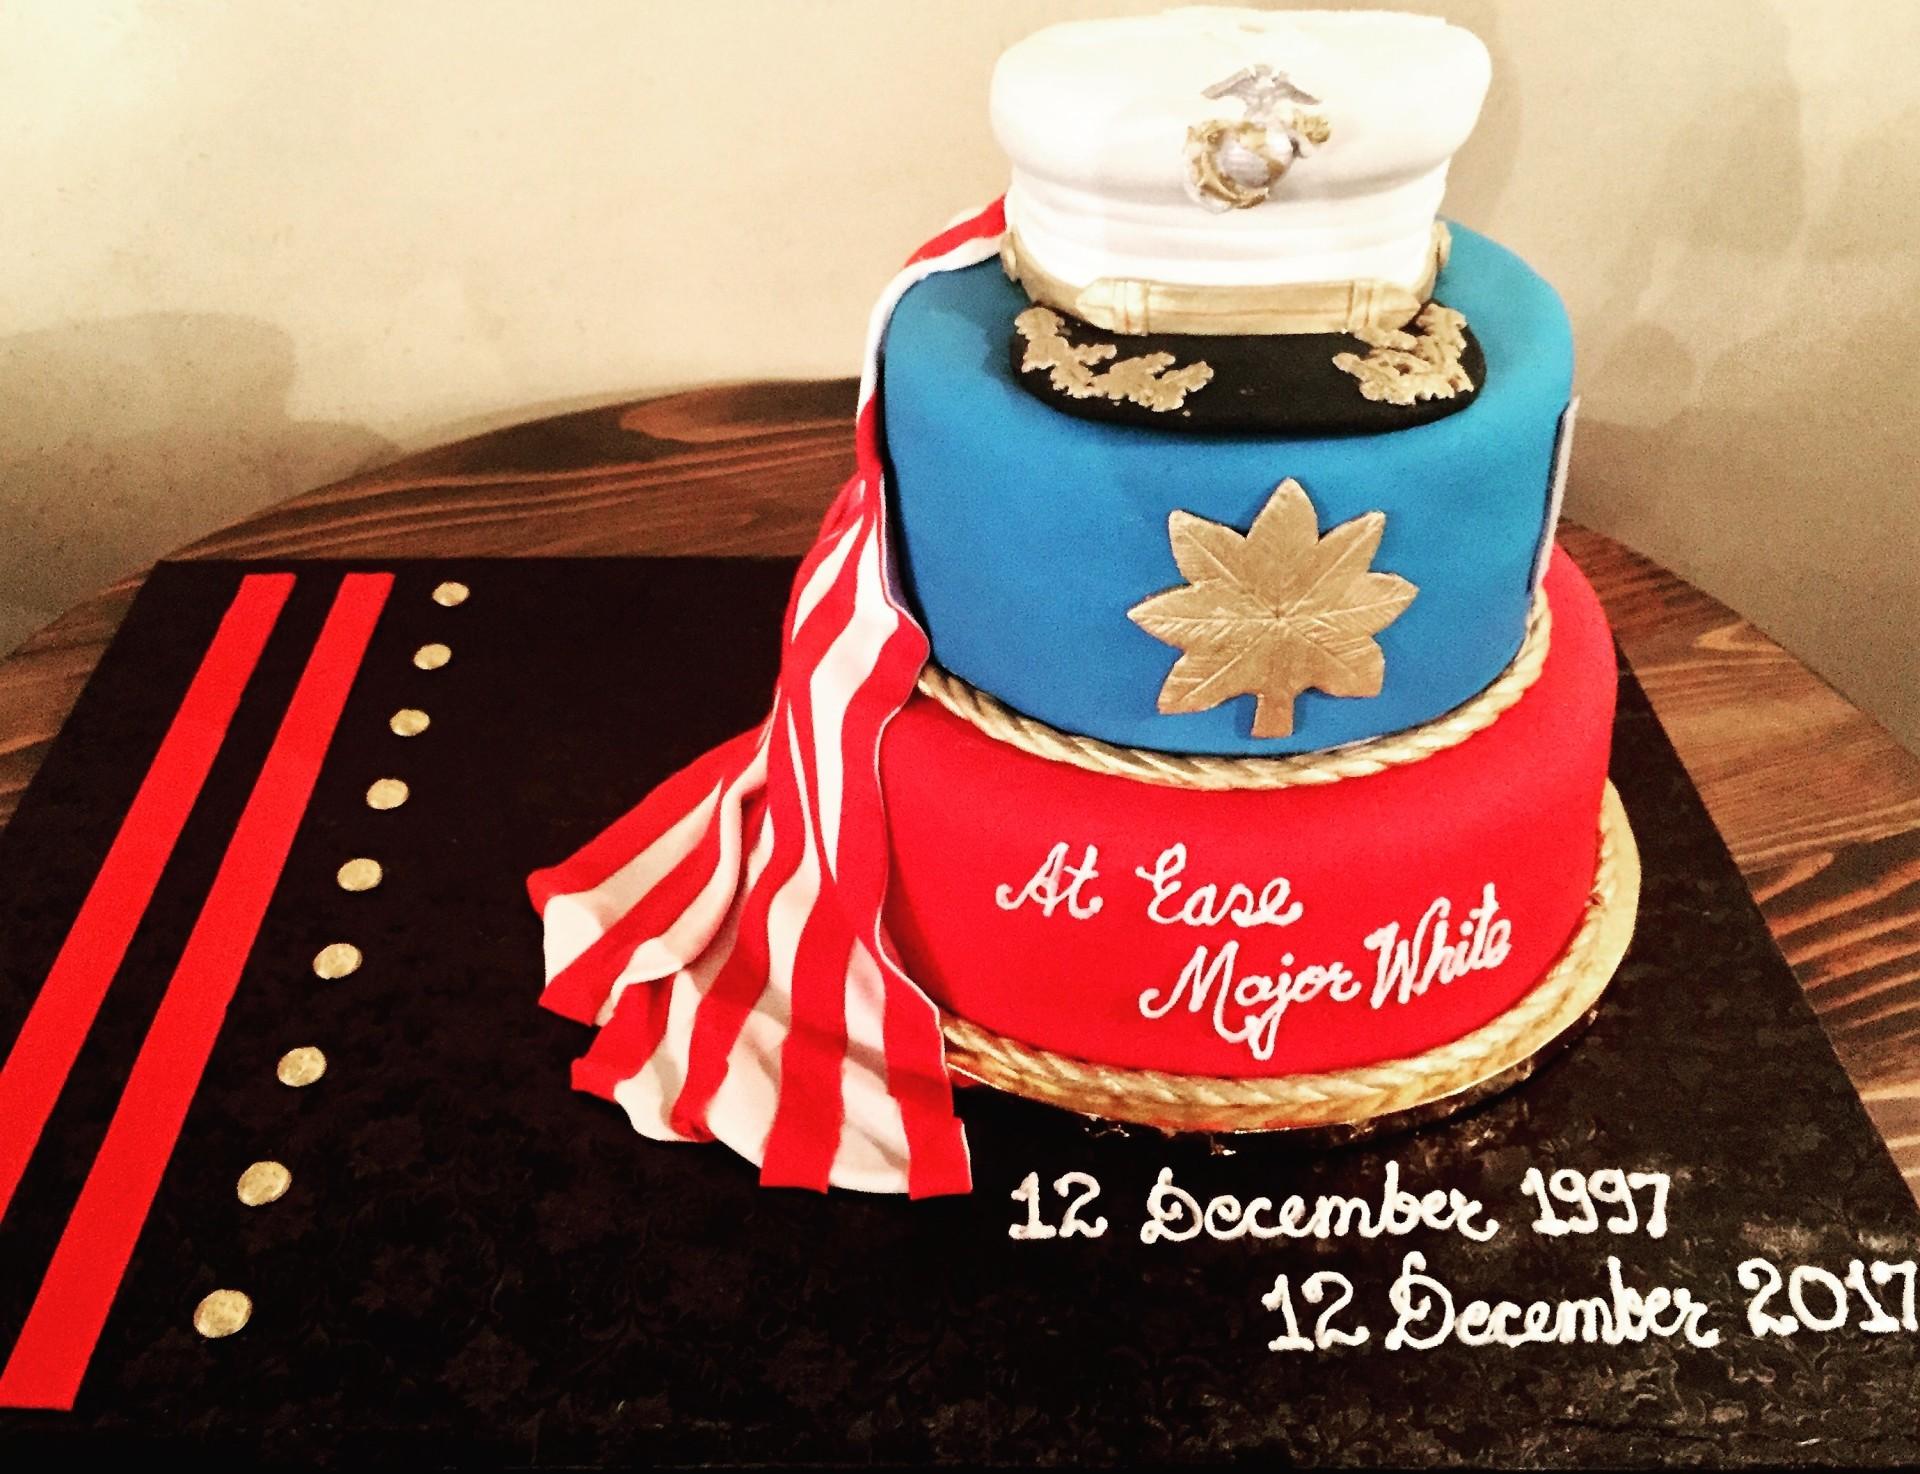 Retirement cake -All fondant